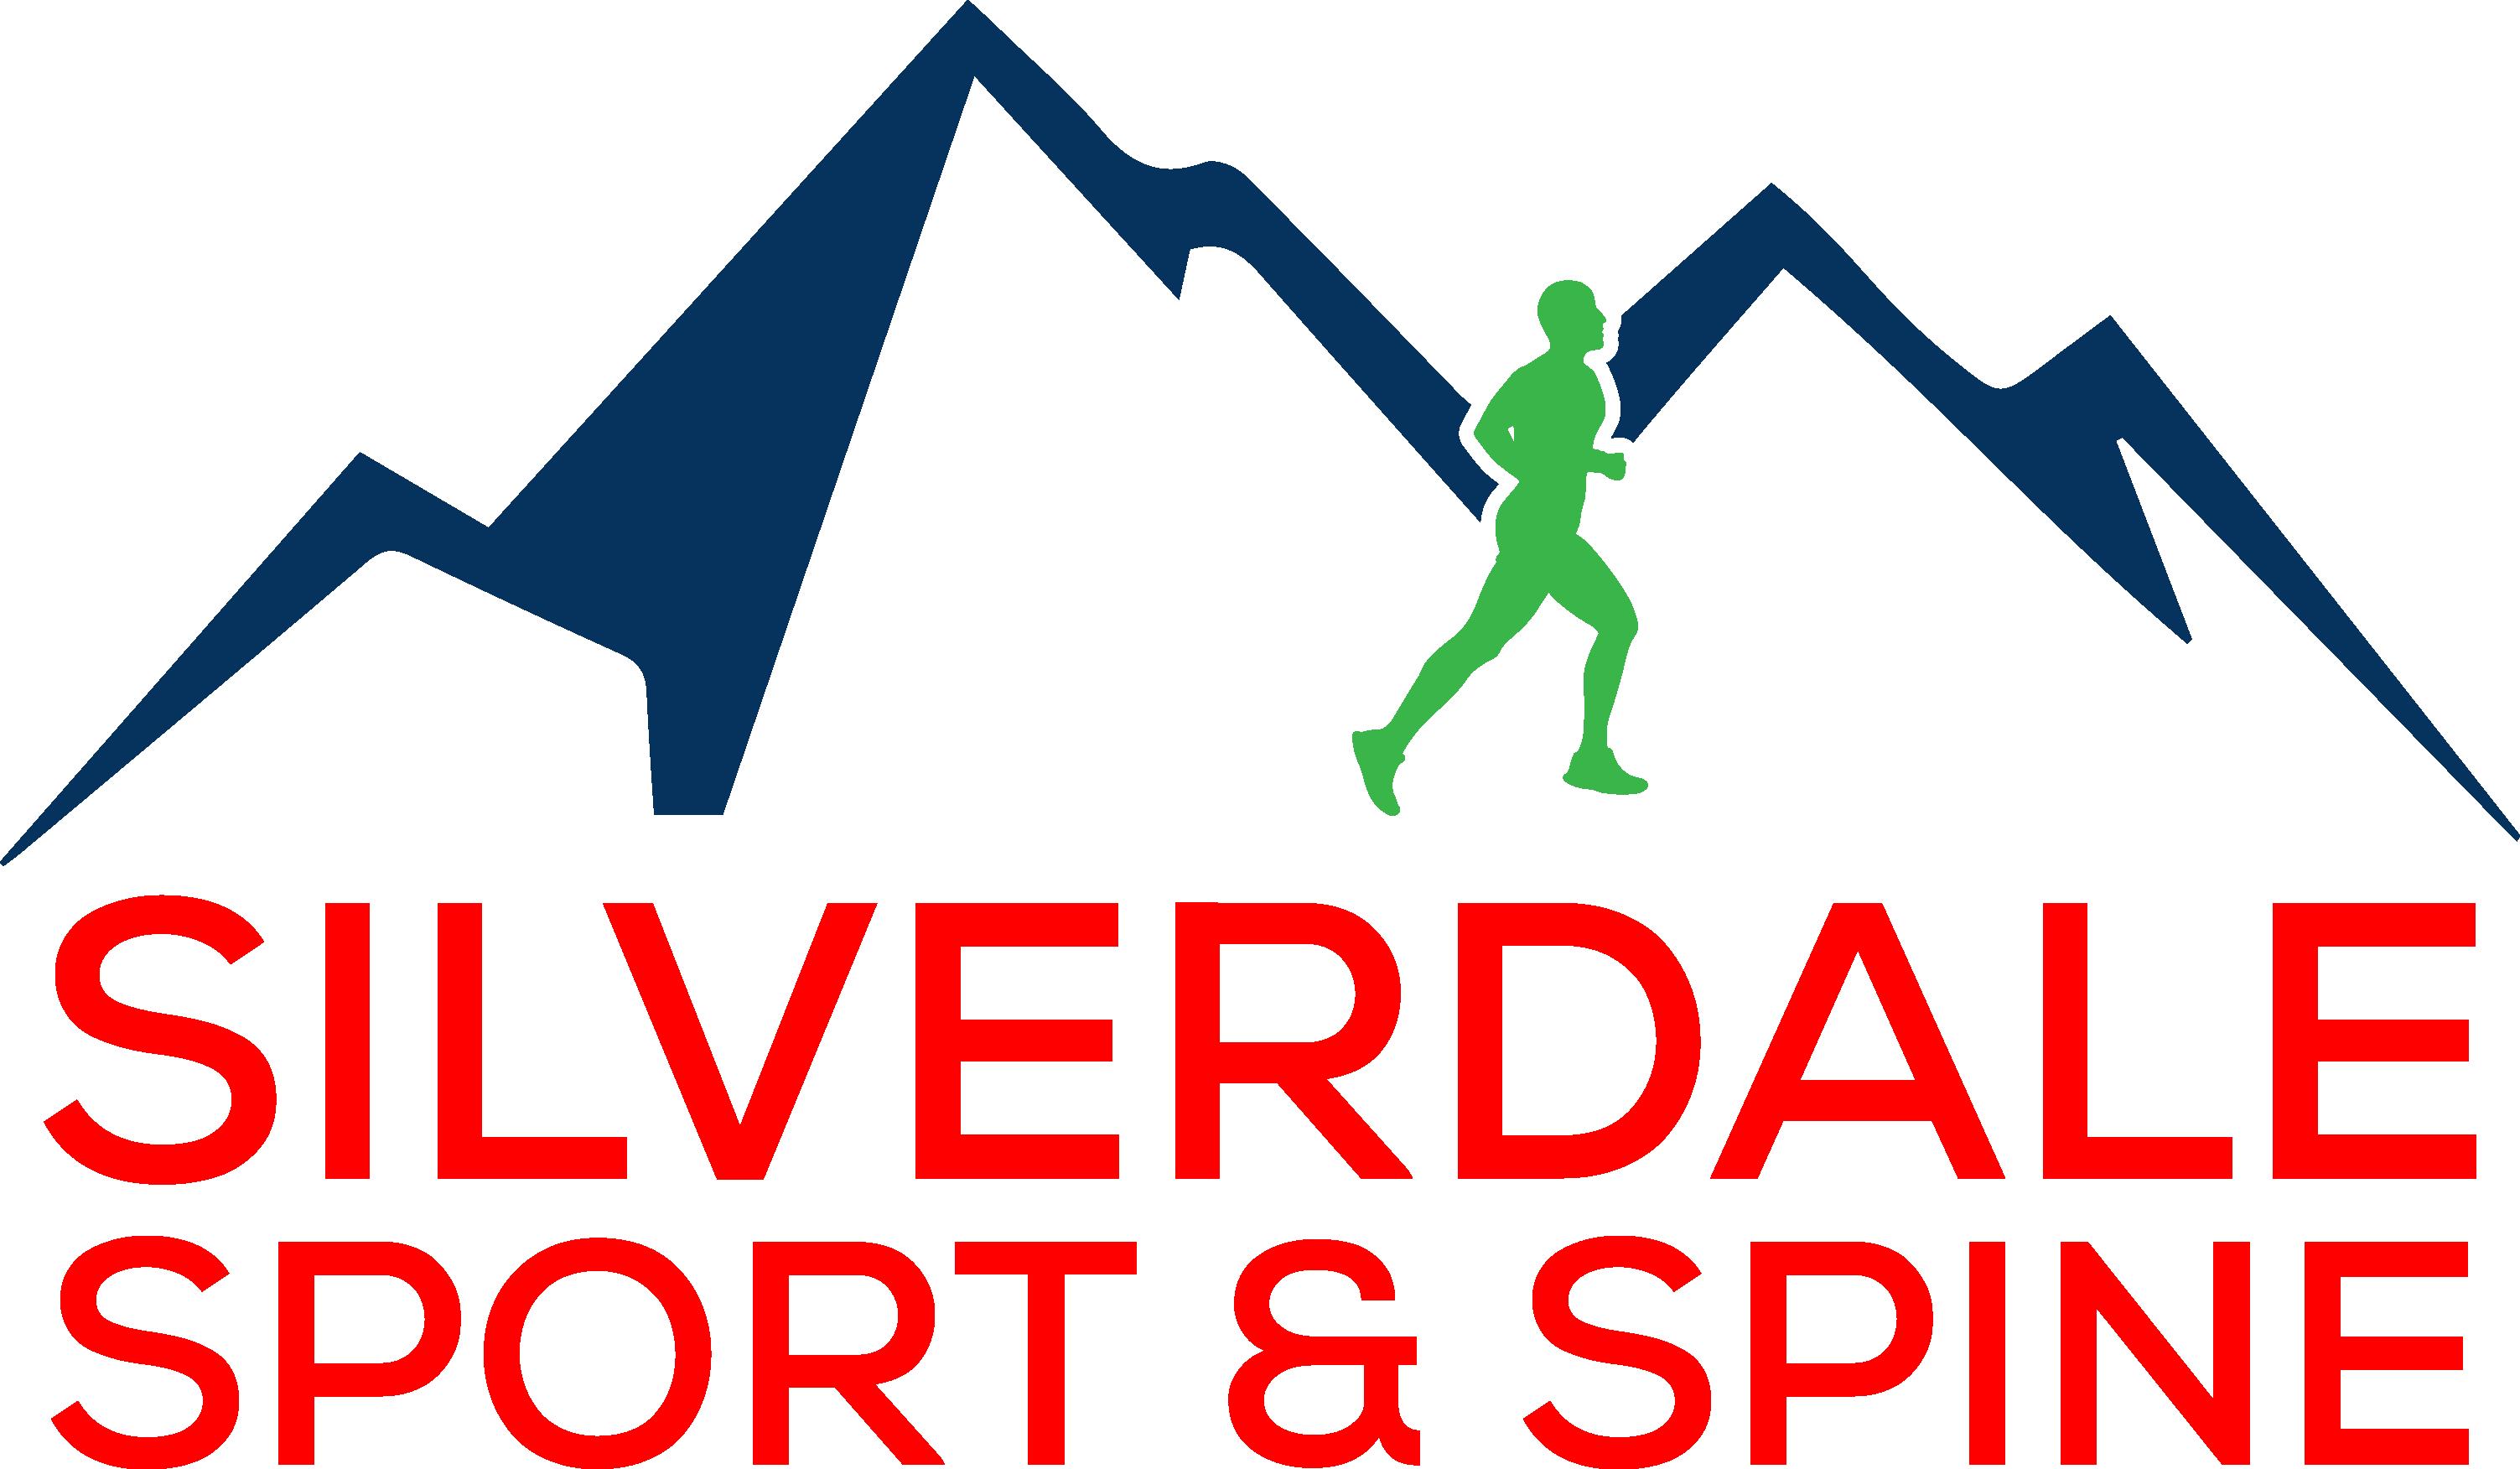 Silverdale Sport & Spine